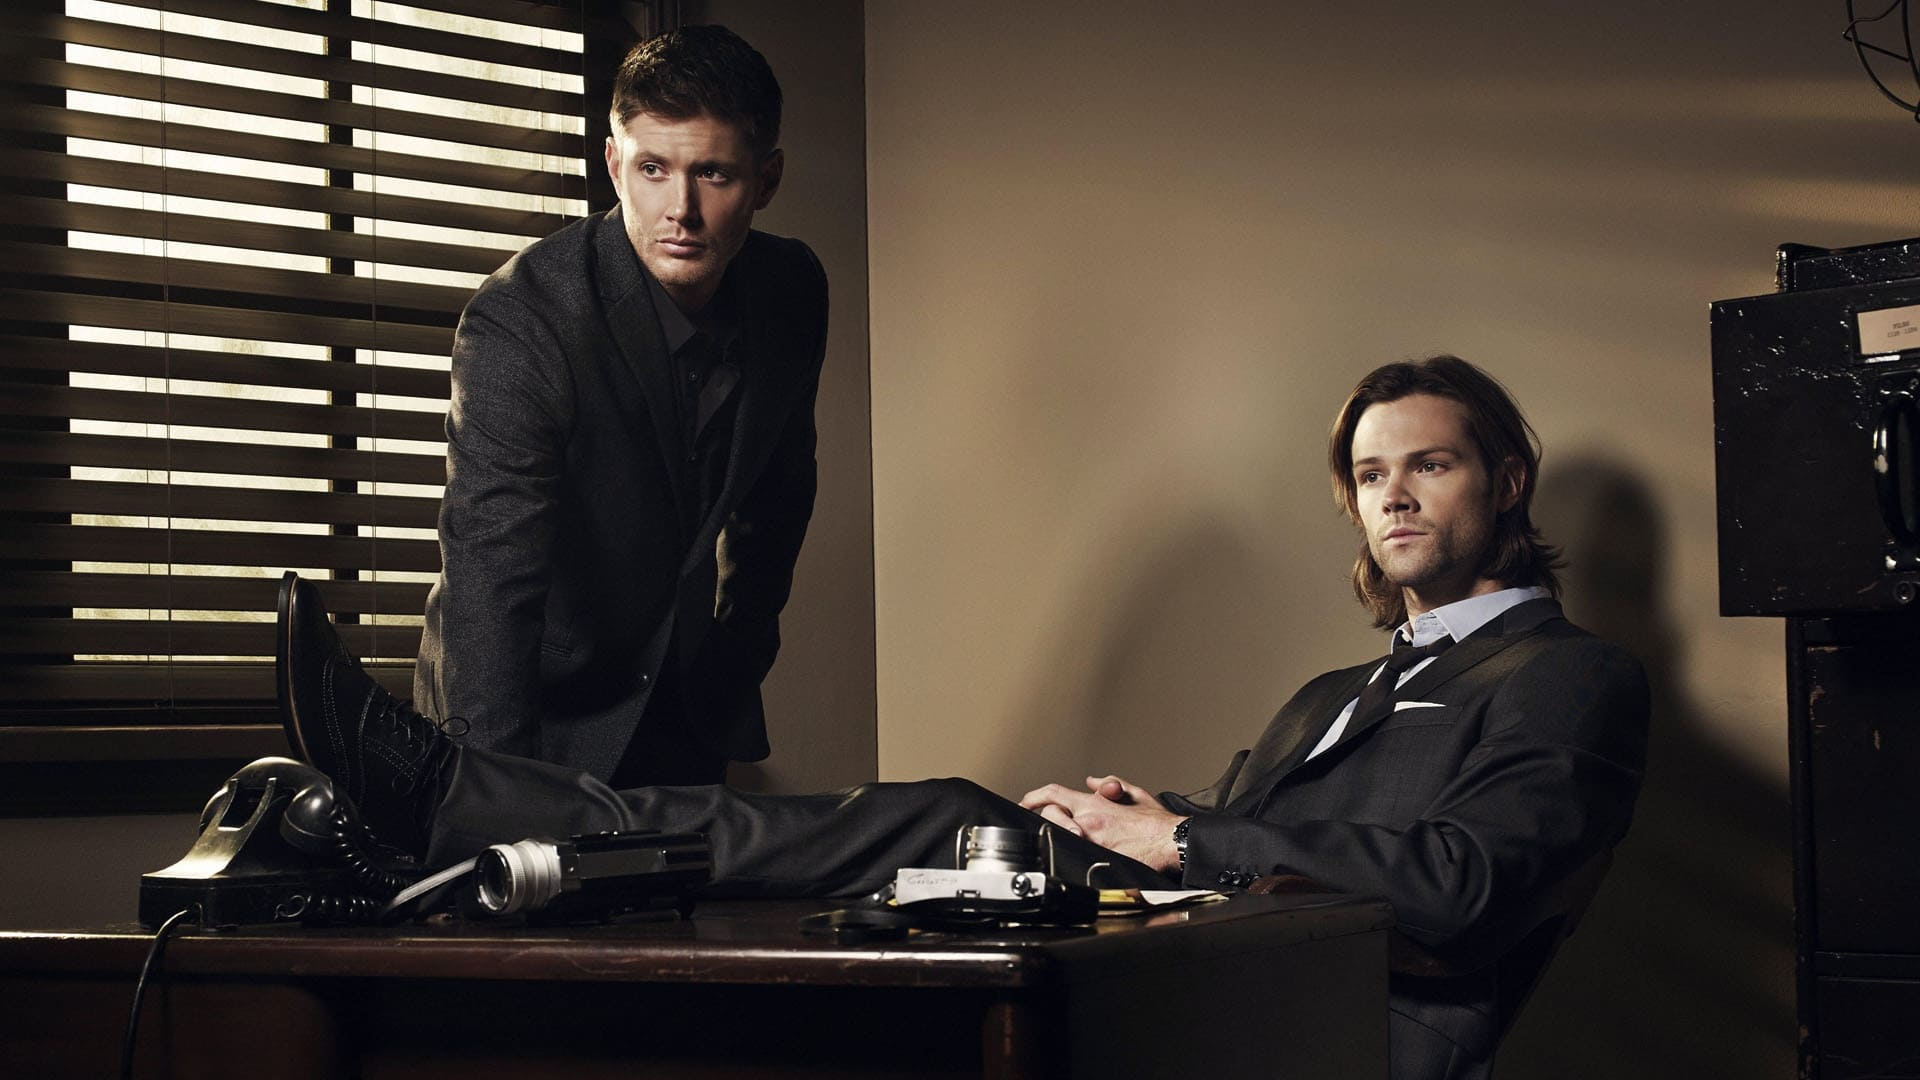 Supernatural - Season 12 Episode 3 The Foundry